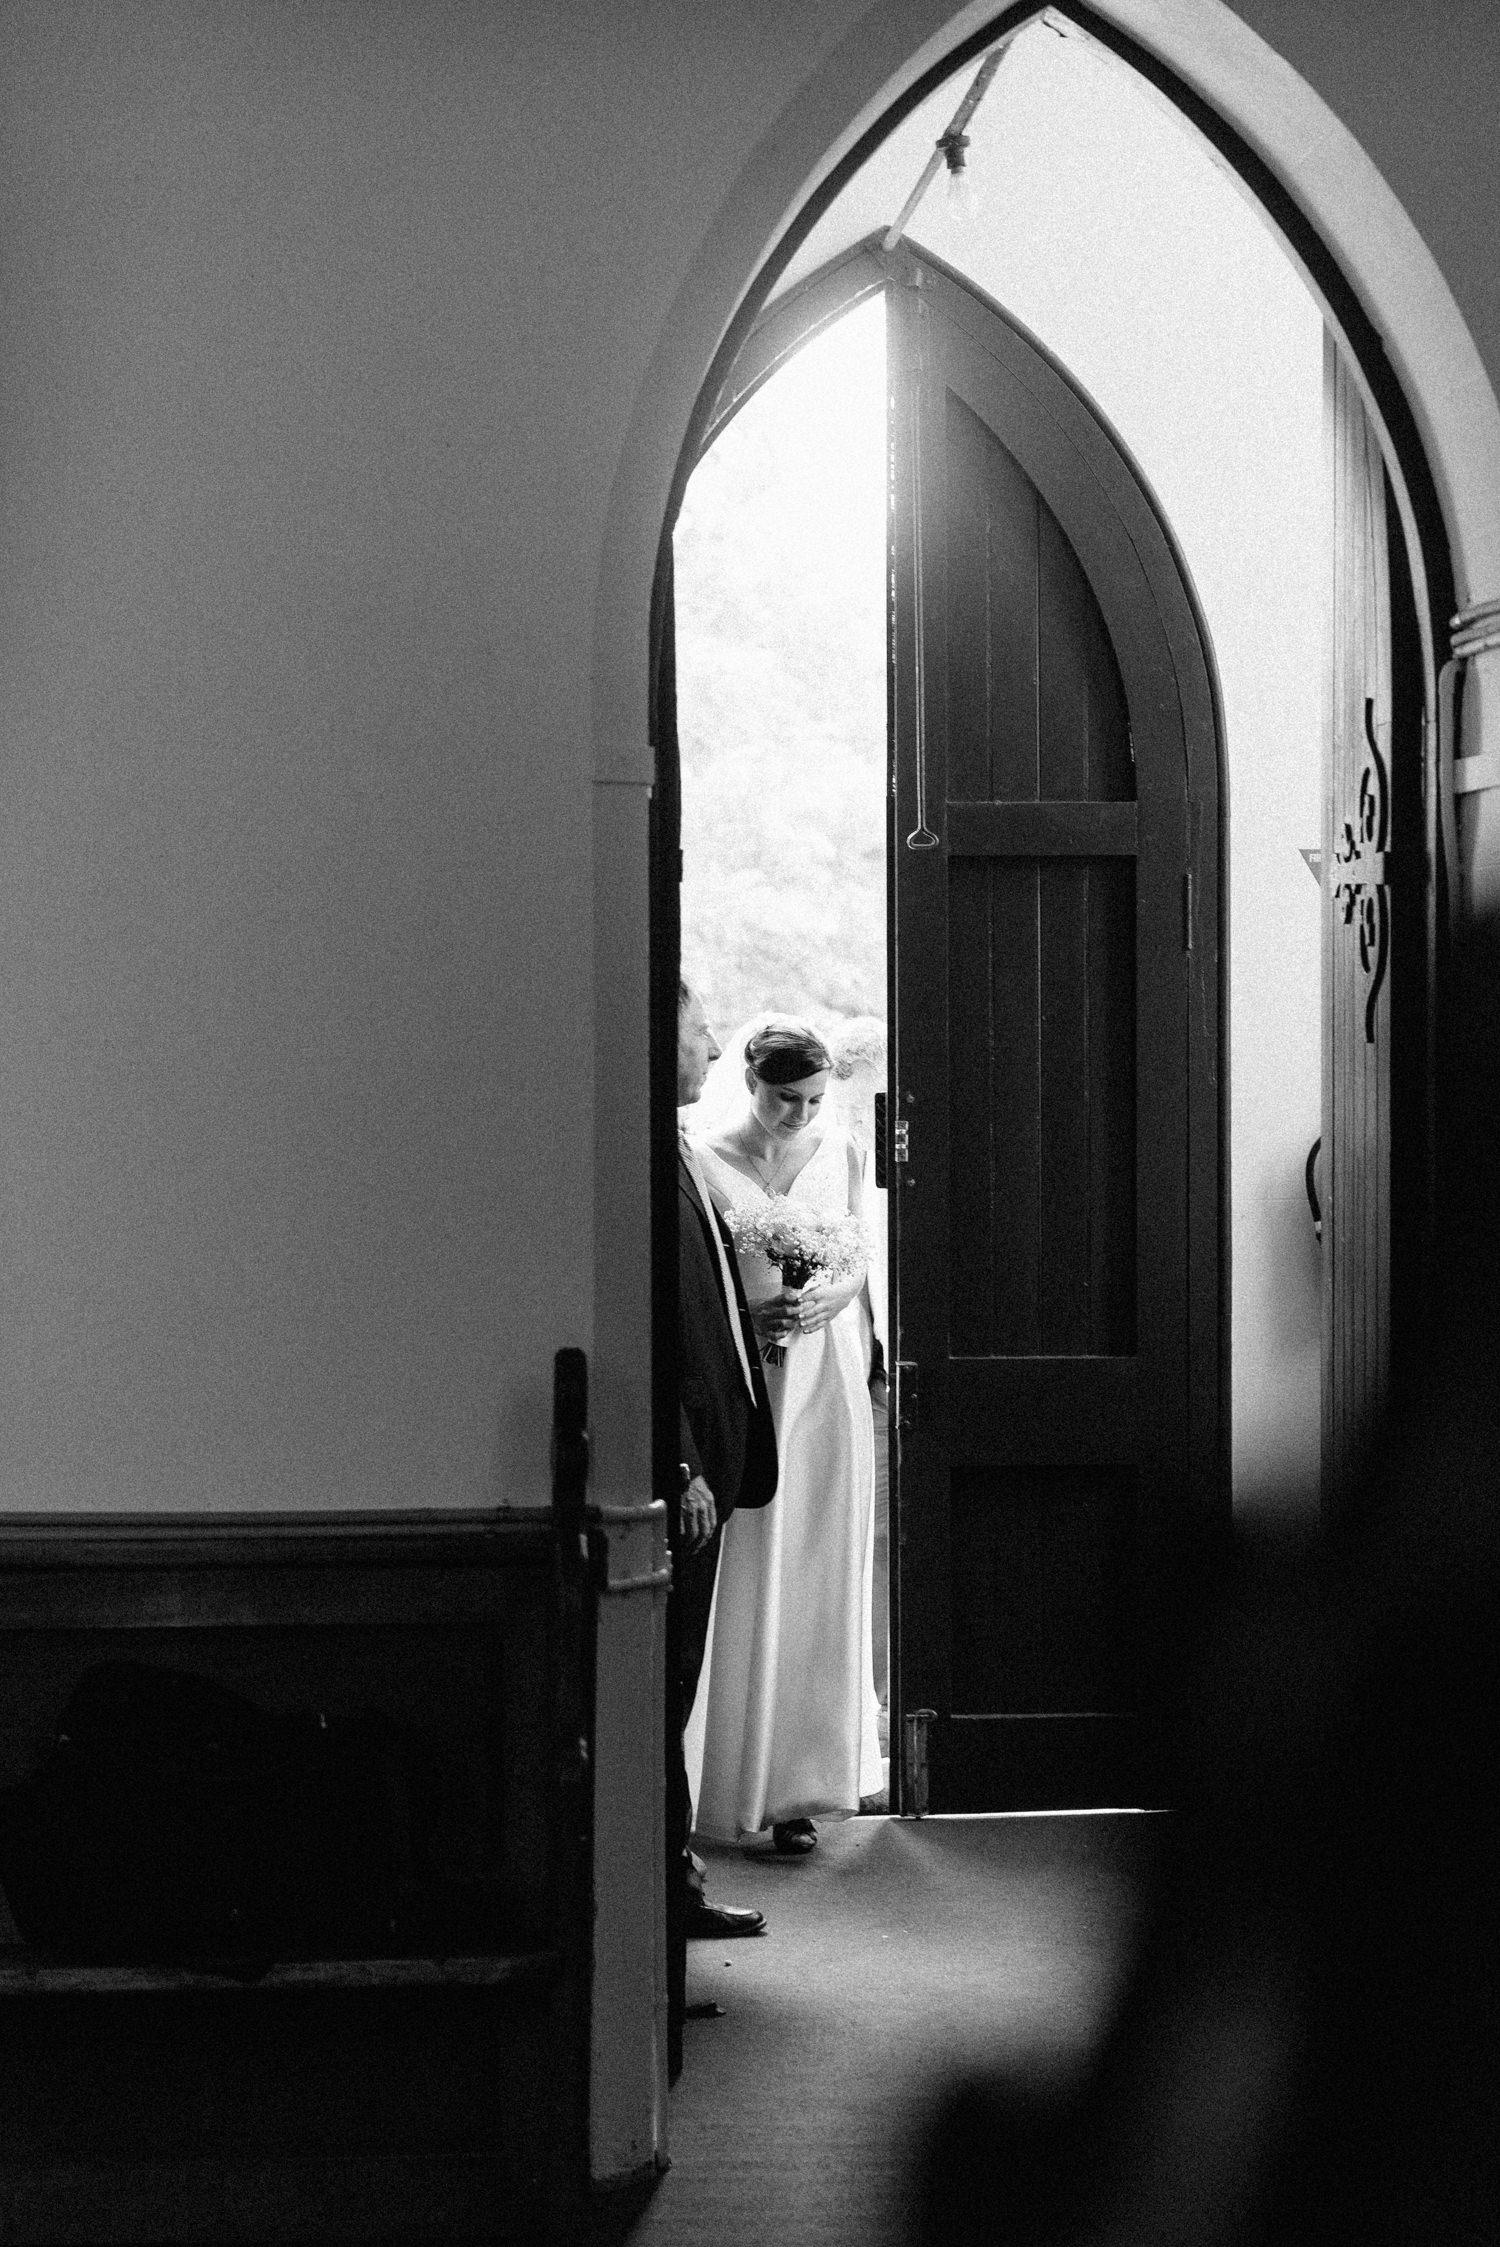 Josef-Chromy-Wedding-Photographer-16.jpg